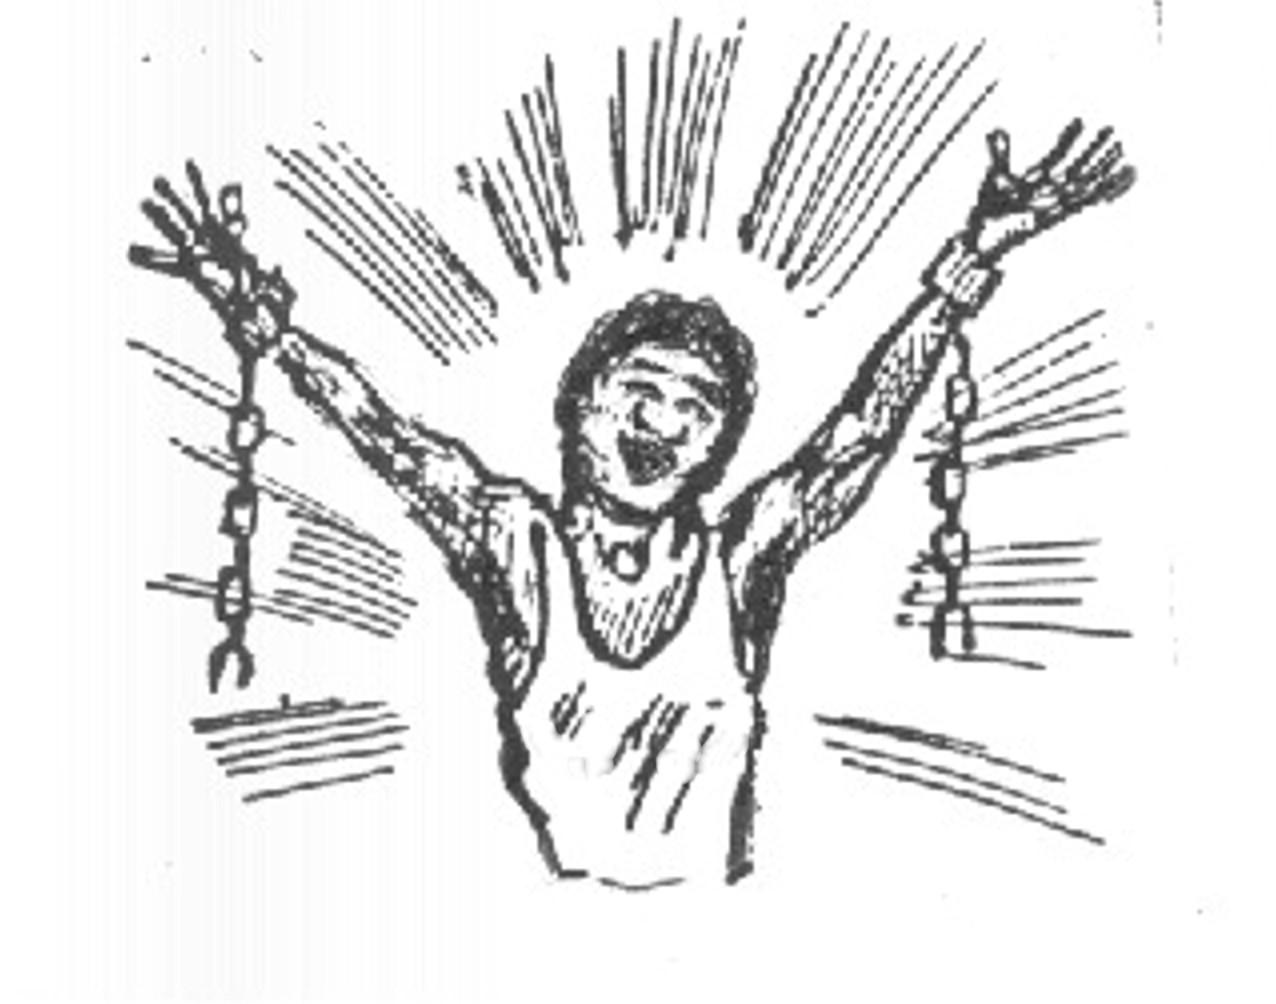 No Slavery Clip Art. Slavery Cliparts-No Slavery Clip Art. Slavery cliparts-6